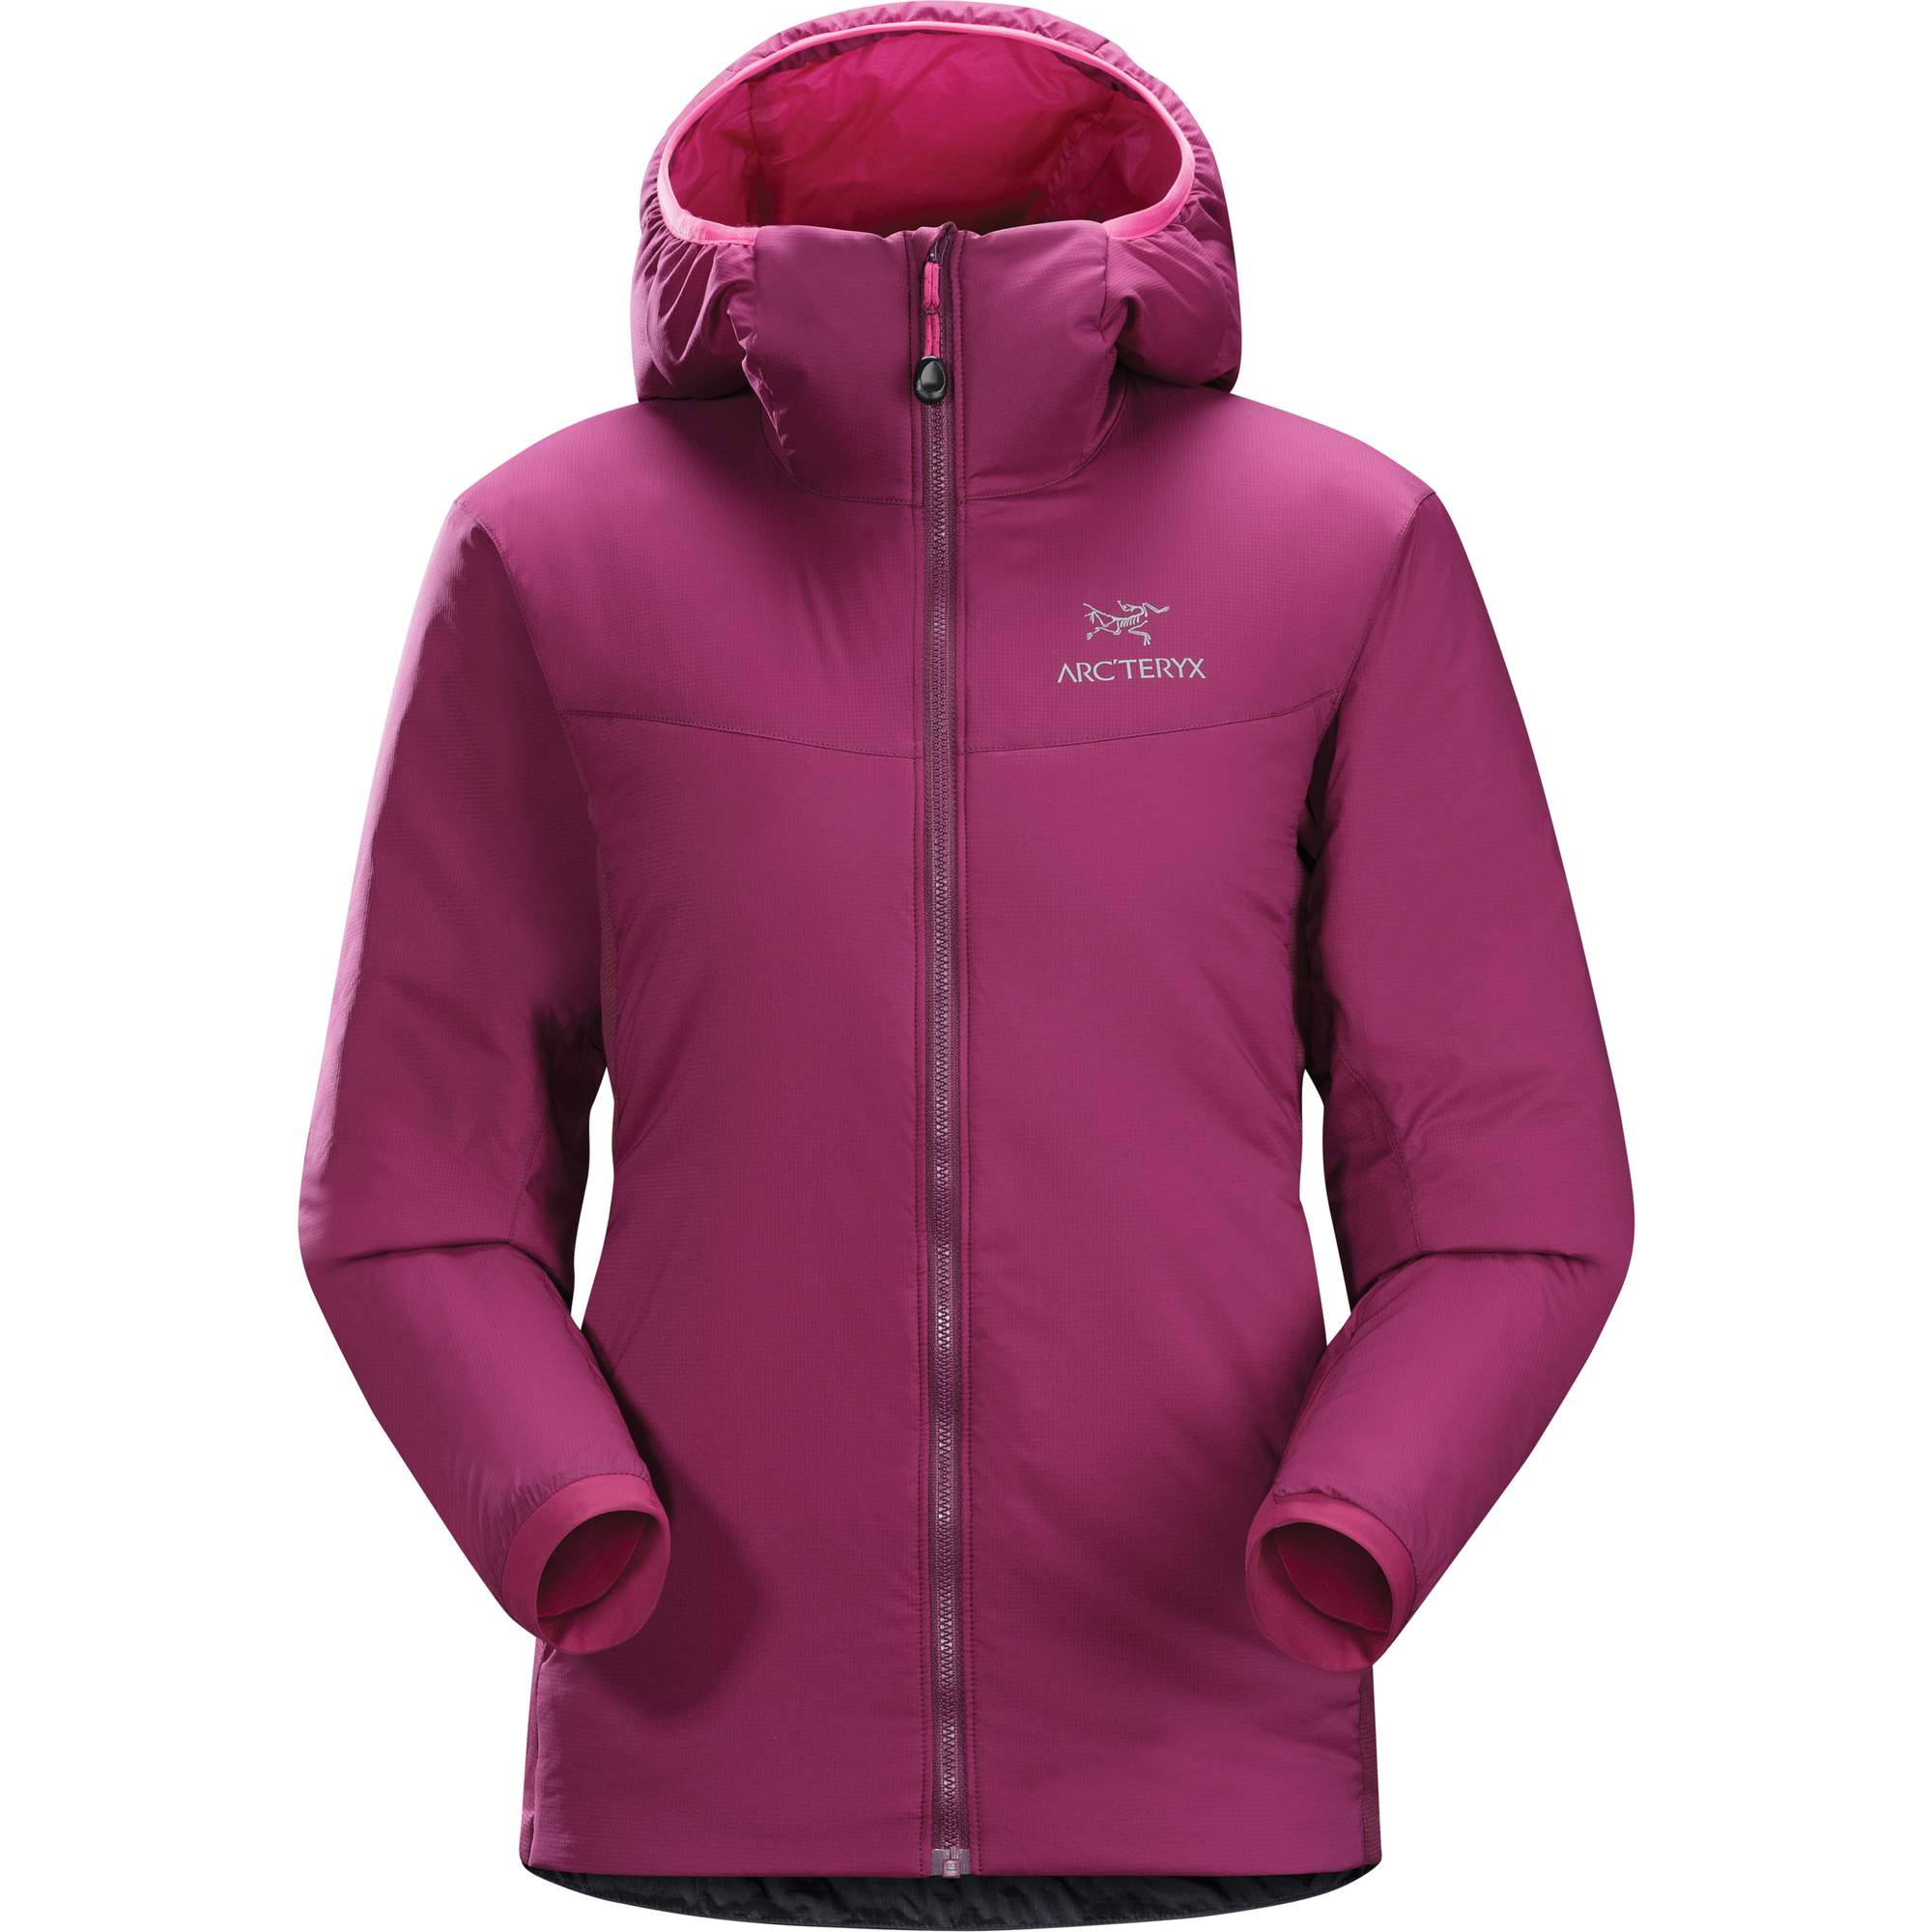 Arc'teryx Atom LT Hoody Frauen Gr. XS - Übergangsjacke - pink-rosa 269210